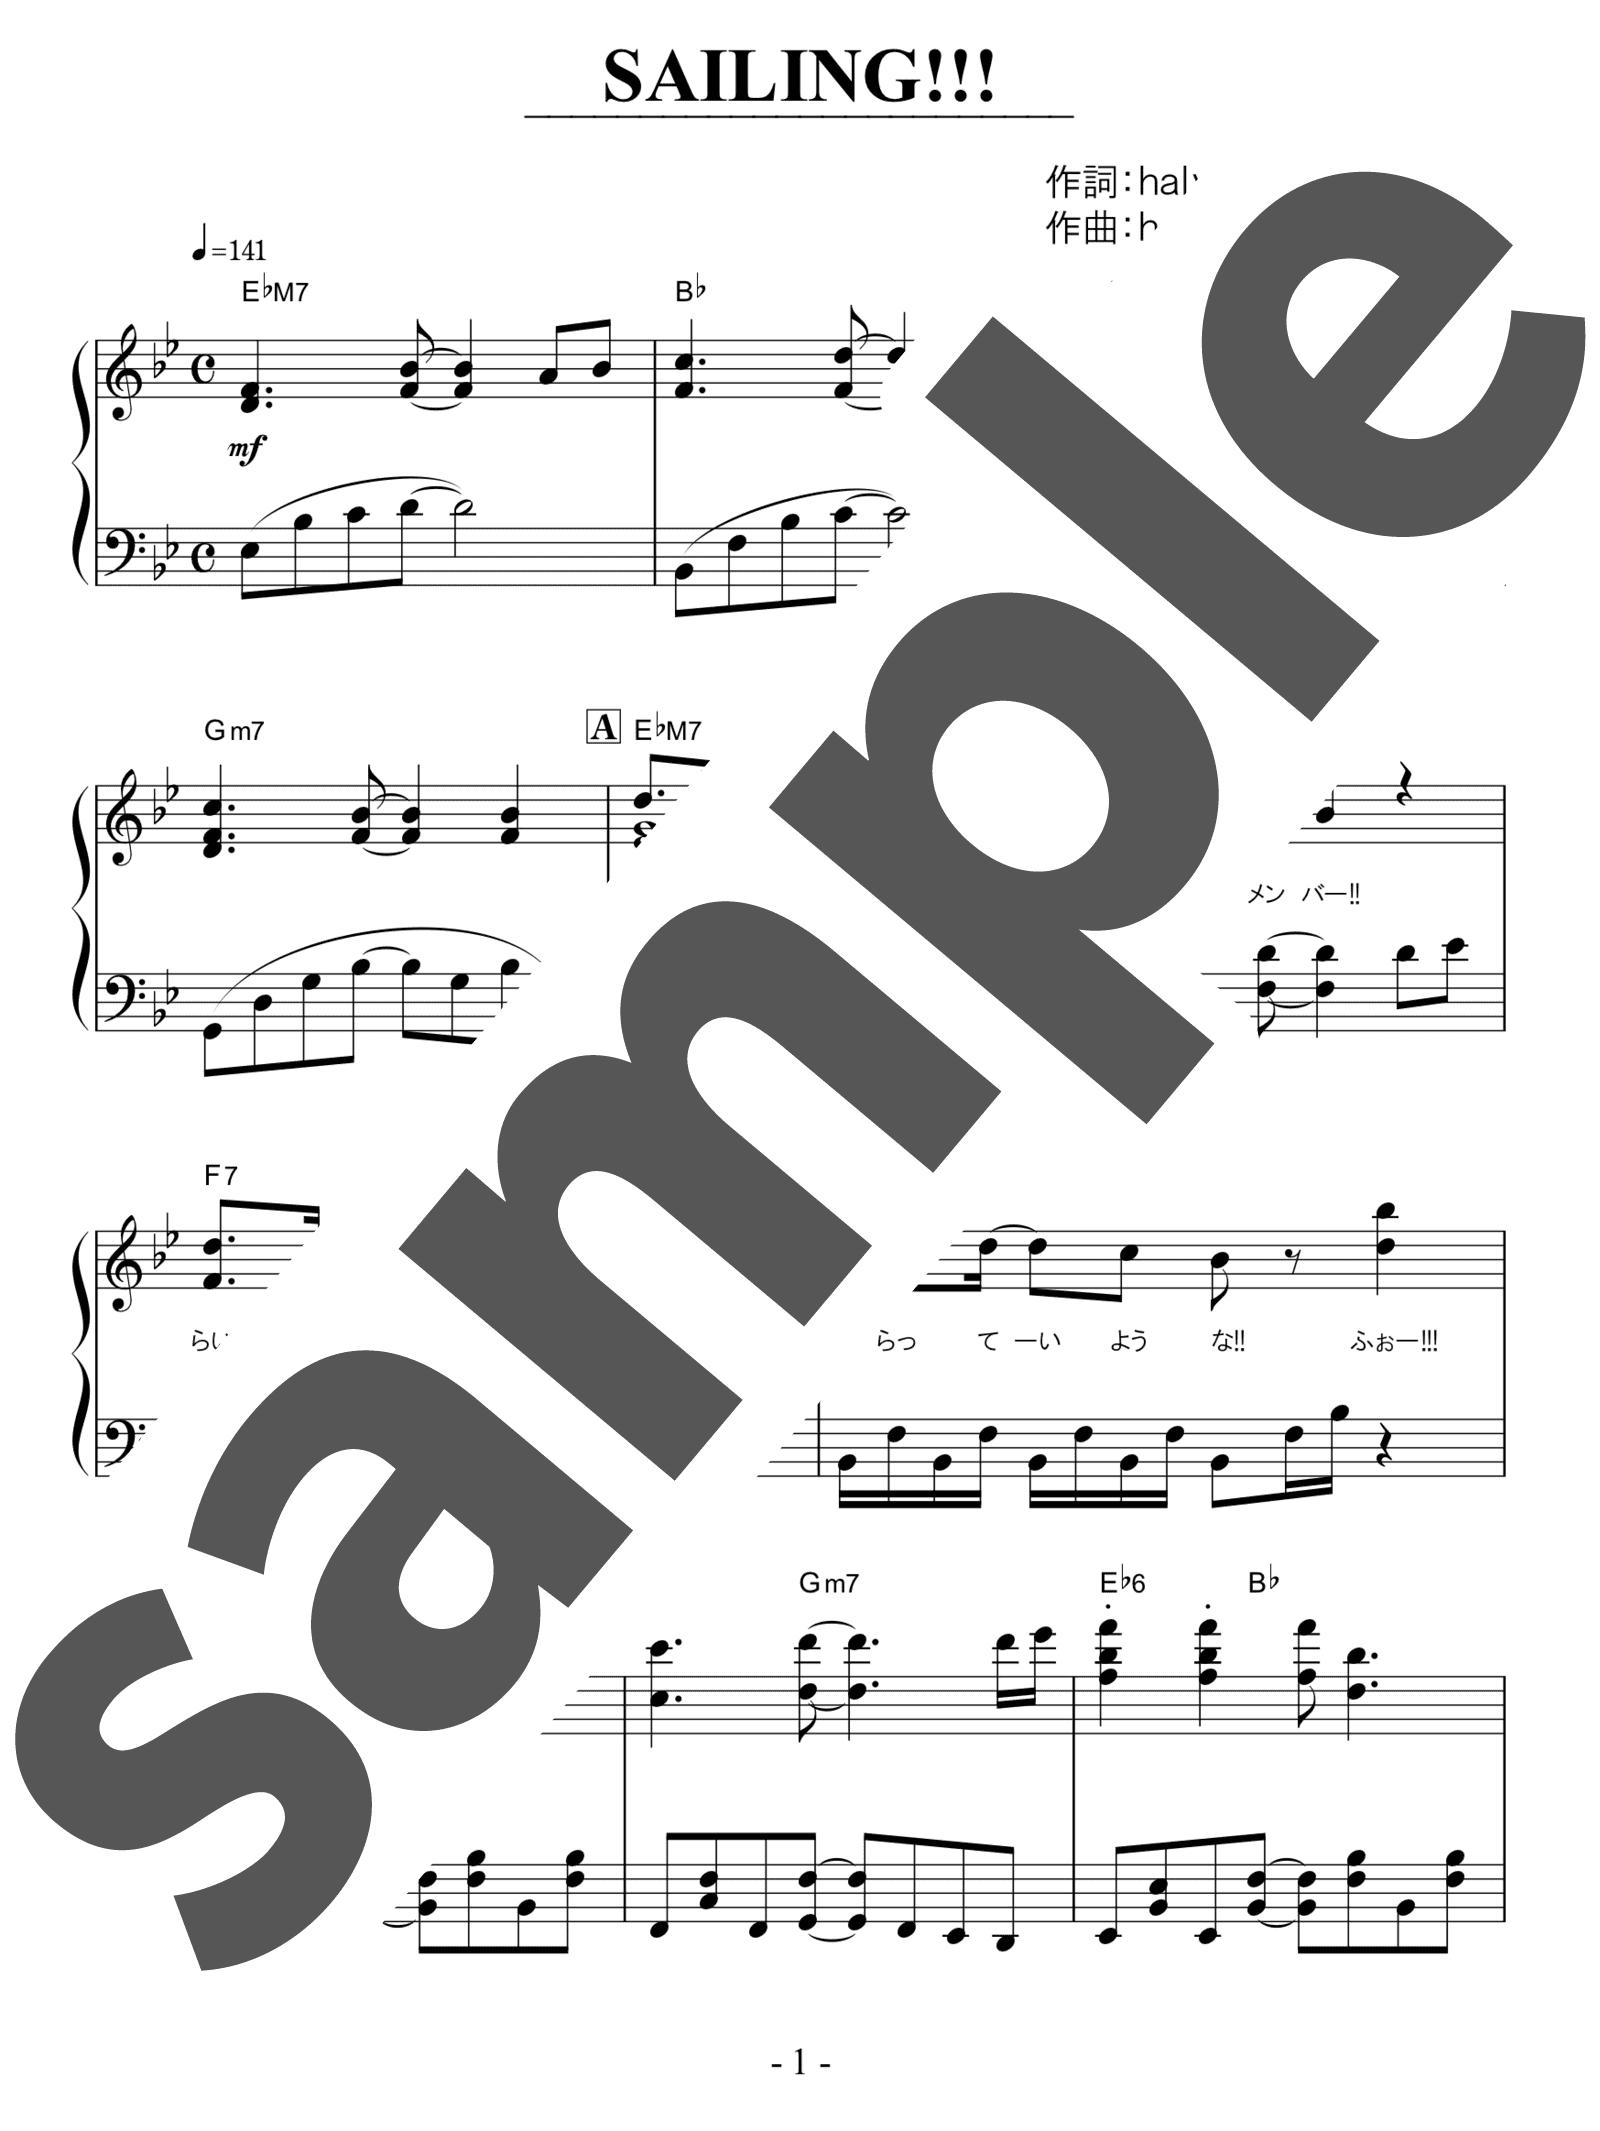 「SAILING!!!!!」のサンプル楽譜